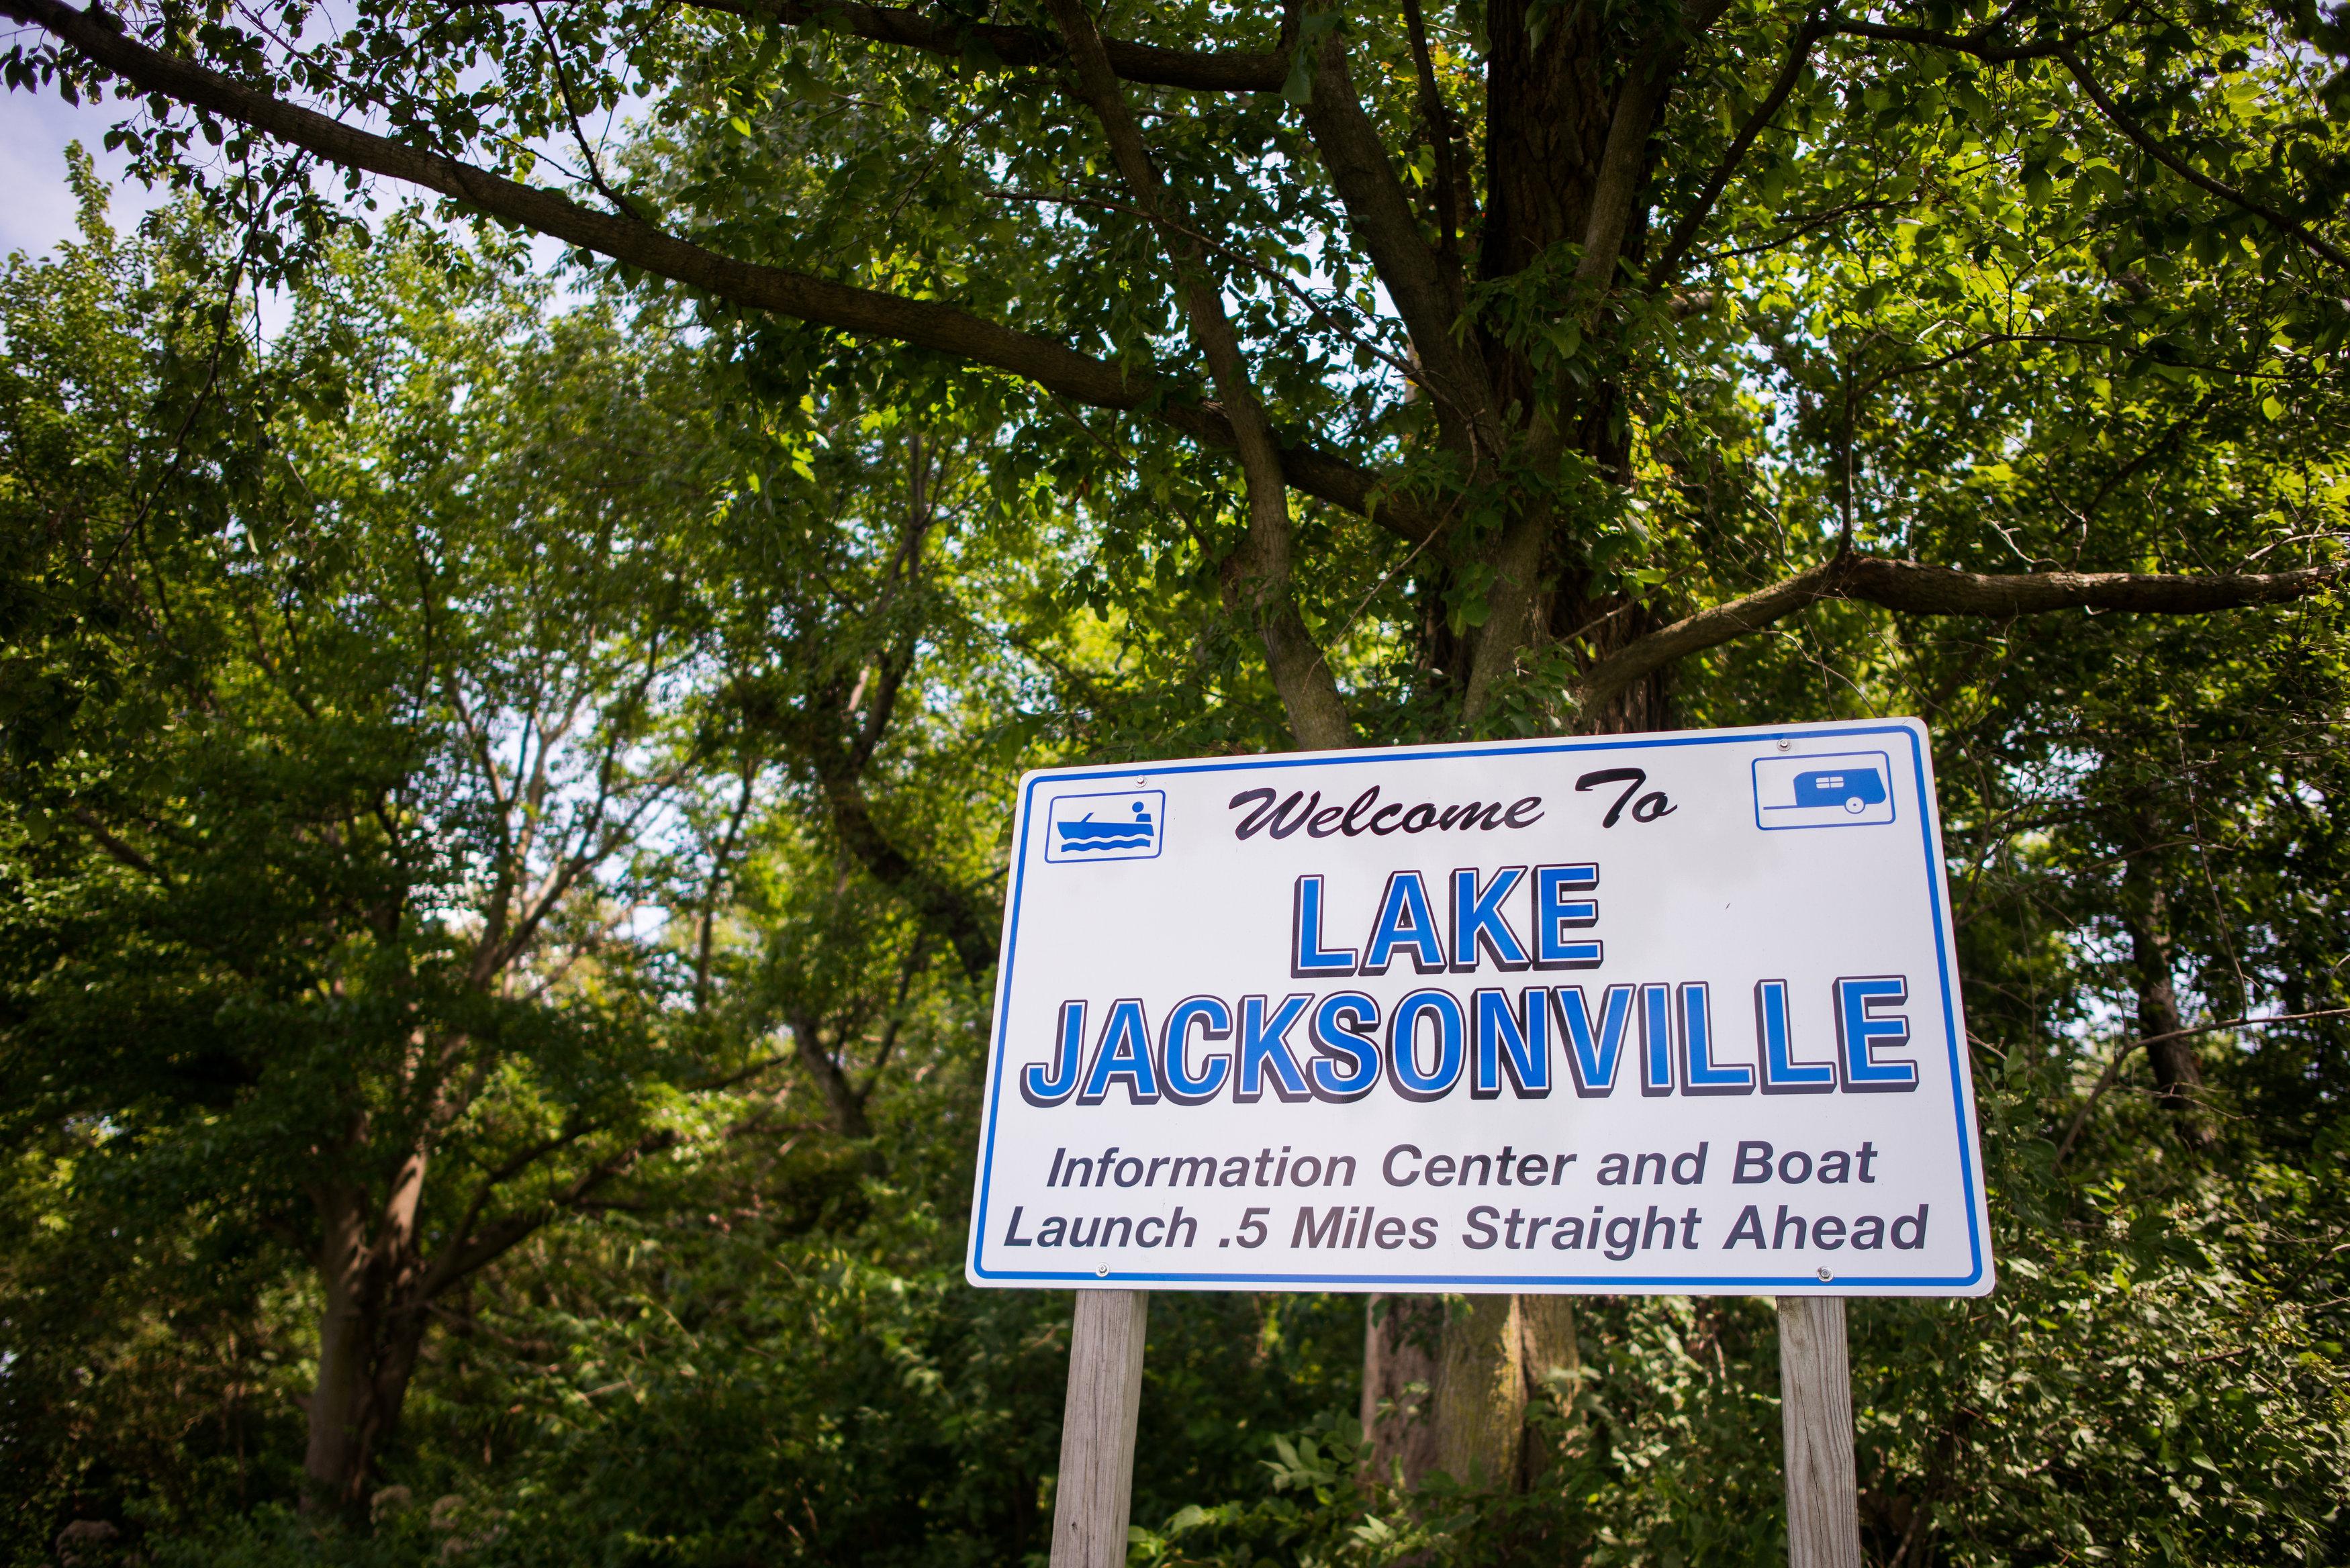 lake jacksonville campground enjoy illinois. Black Bedroom Furniture Sets. Home Design Ideas